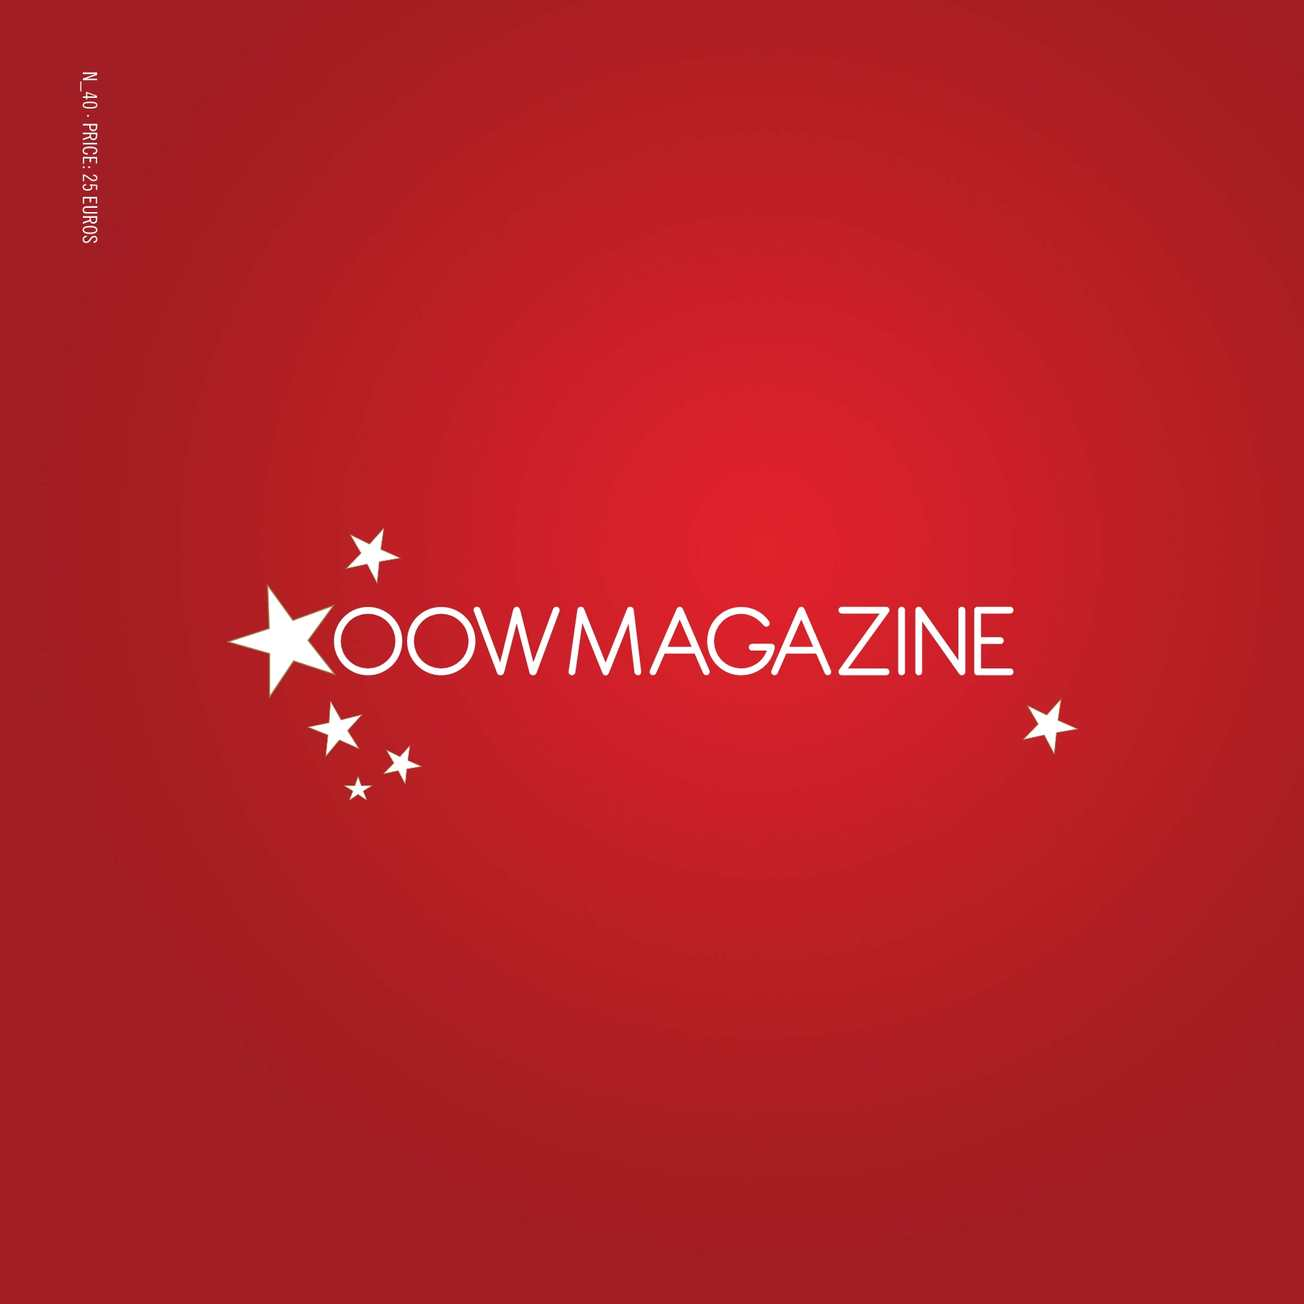 Calaméo - Xoowmagazine 40 5861f394c7ff